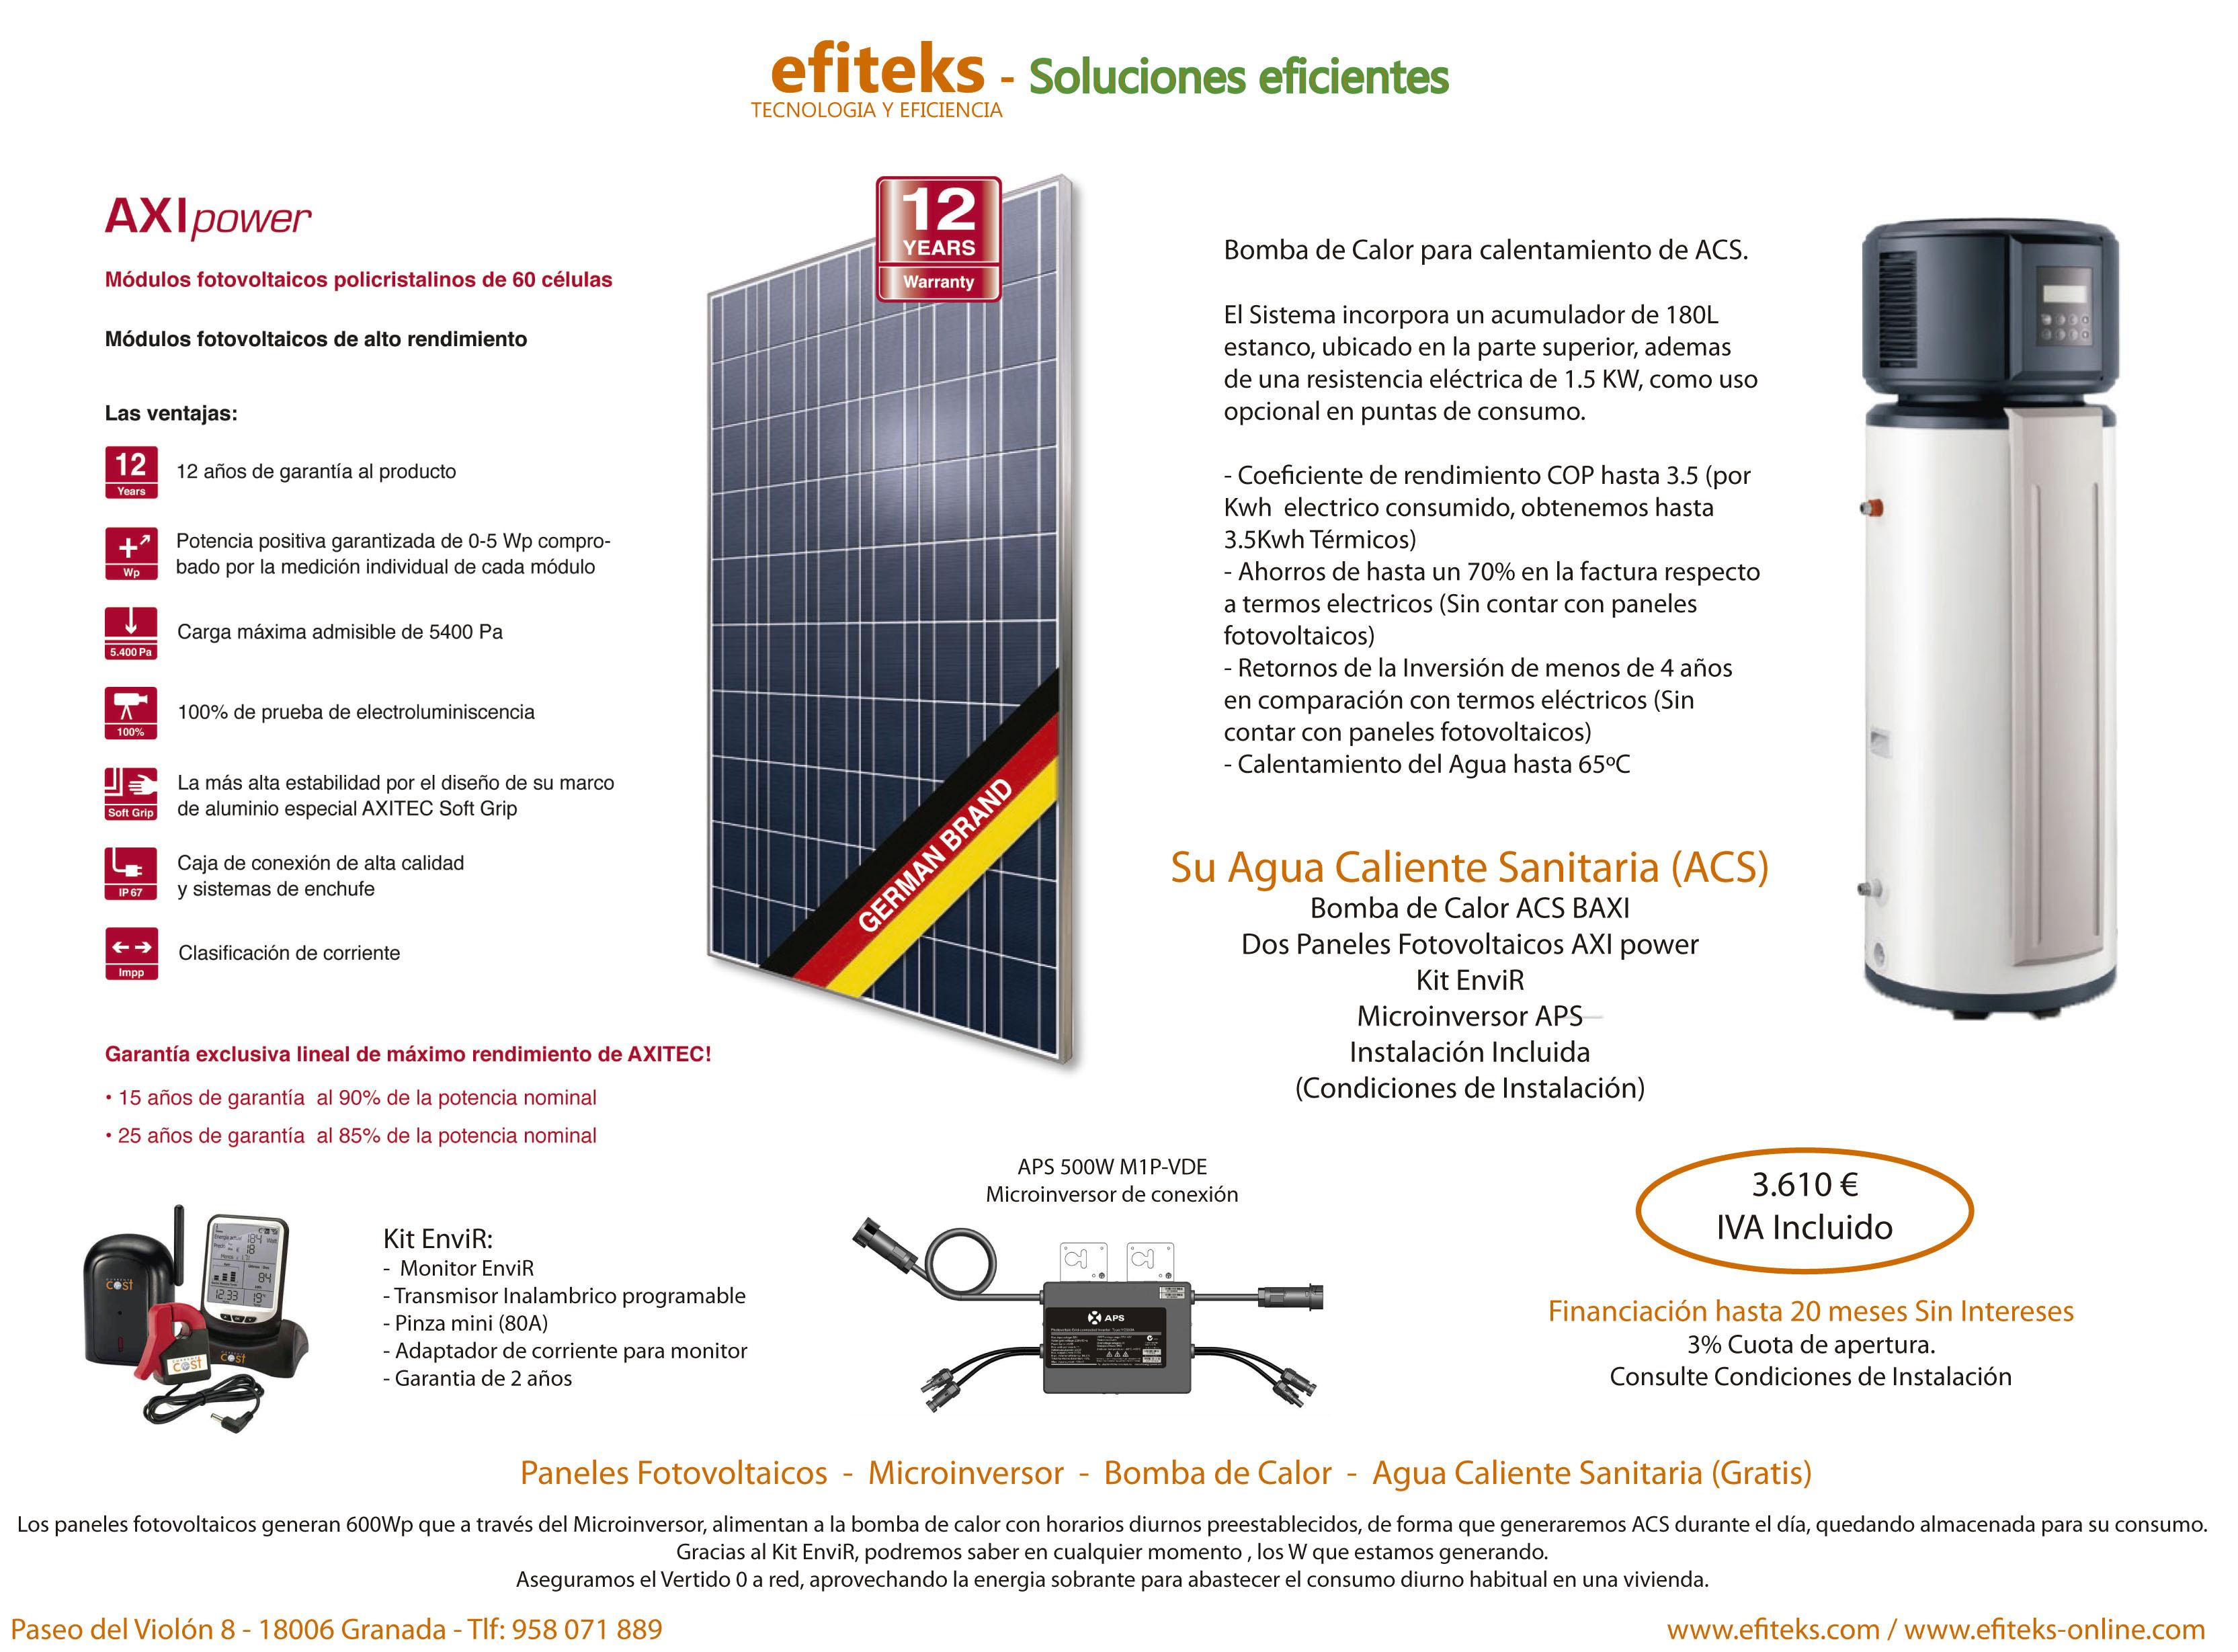 OFERTA BOMBA DE CALOR Y FOTOVOLTAICA A4 - Sistemas fotovoltaicos efiteks